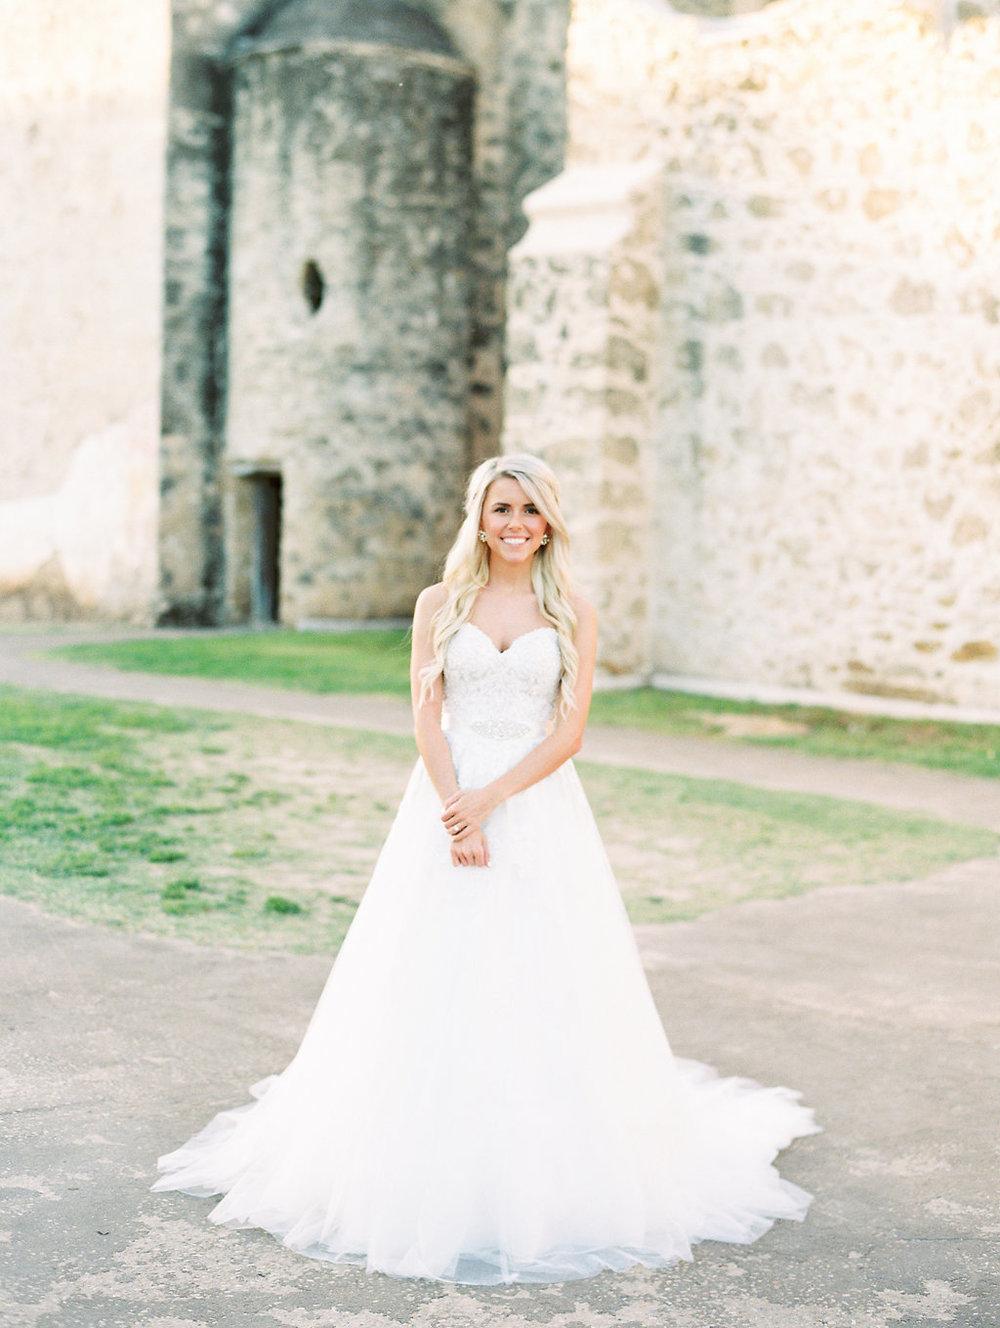 Best-Austin-Denver-California-Wedding-Photographers-fine-art-film-Bridal-session-Mission-San-Jose-San-Antonio-1.jpg